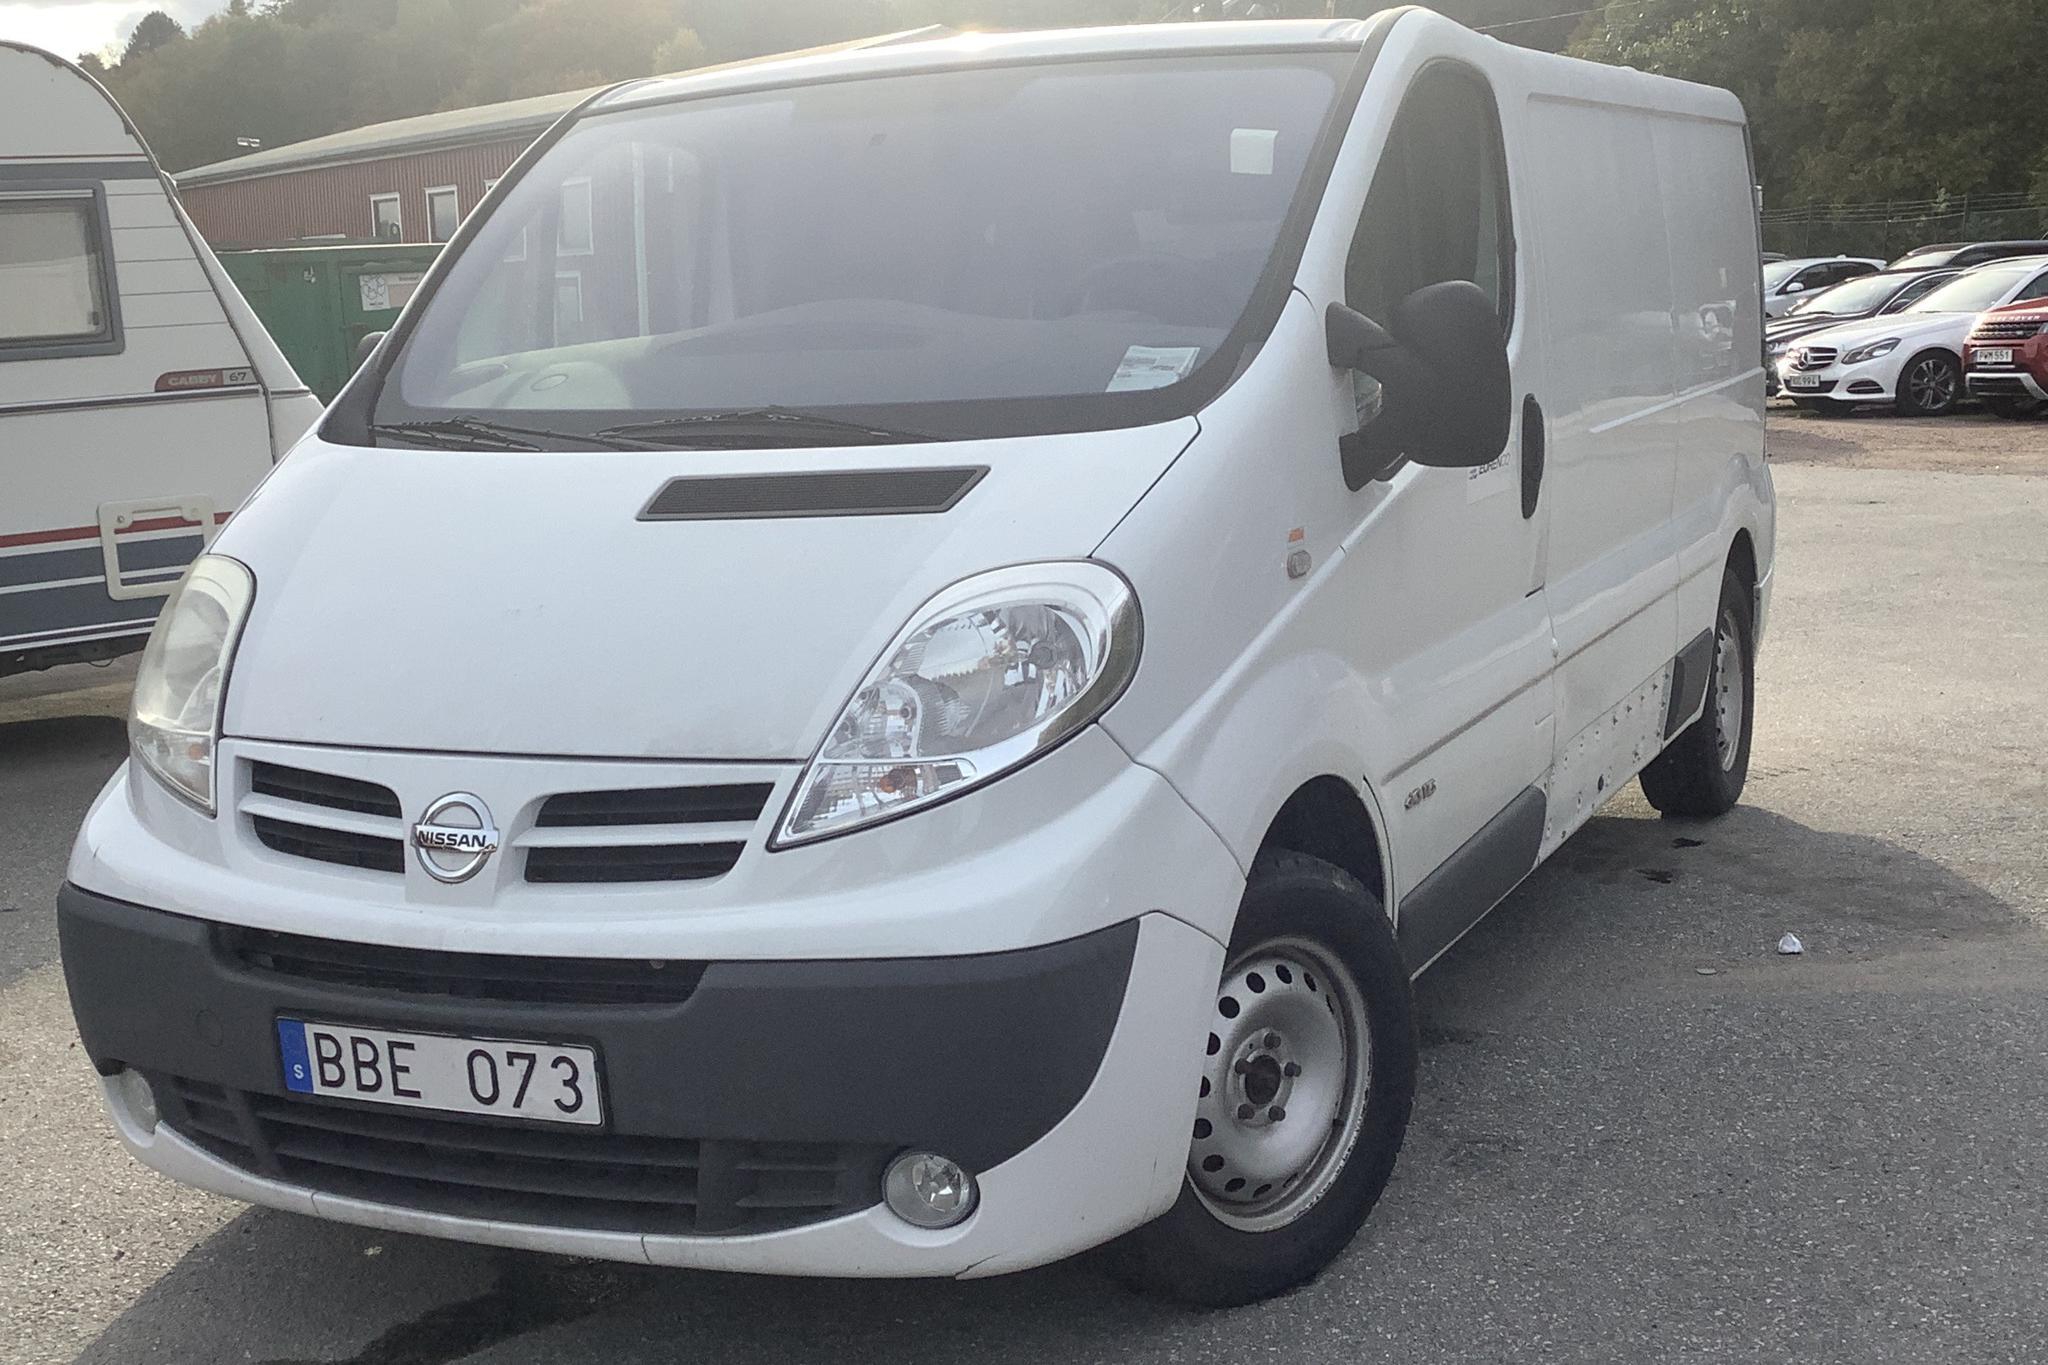 Nissan Primastar 2.0 dCi (114hk) - 7 940 mil - Manuell - vit - 2011